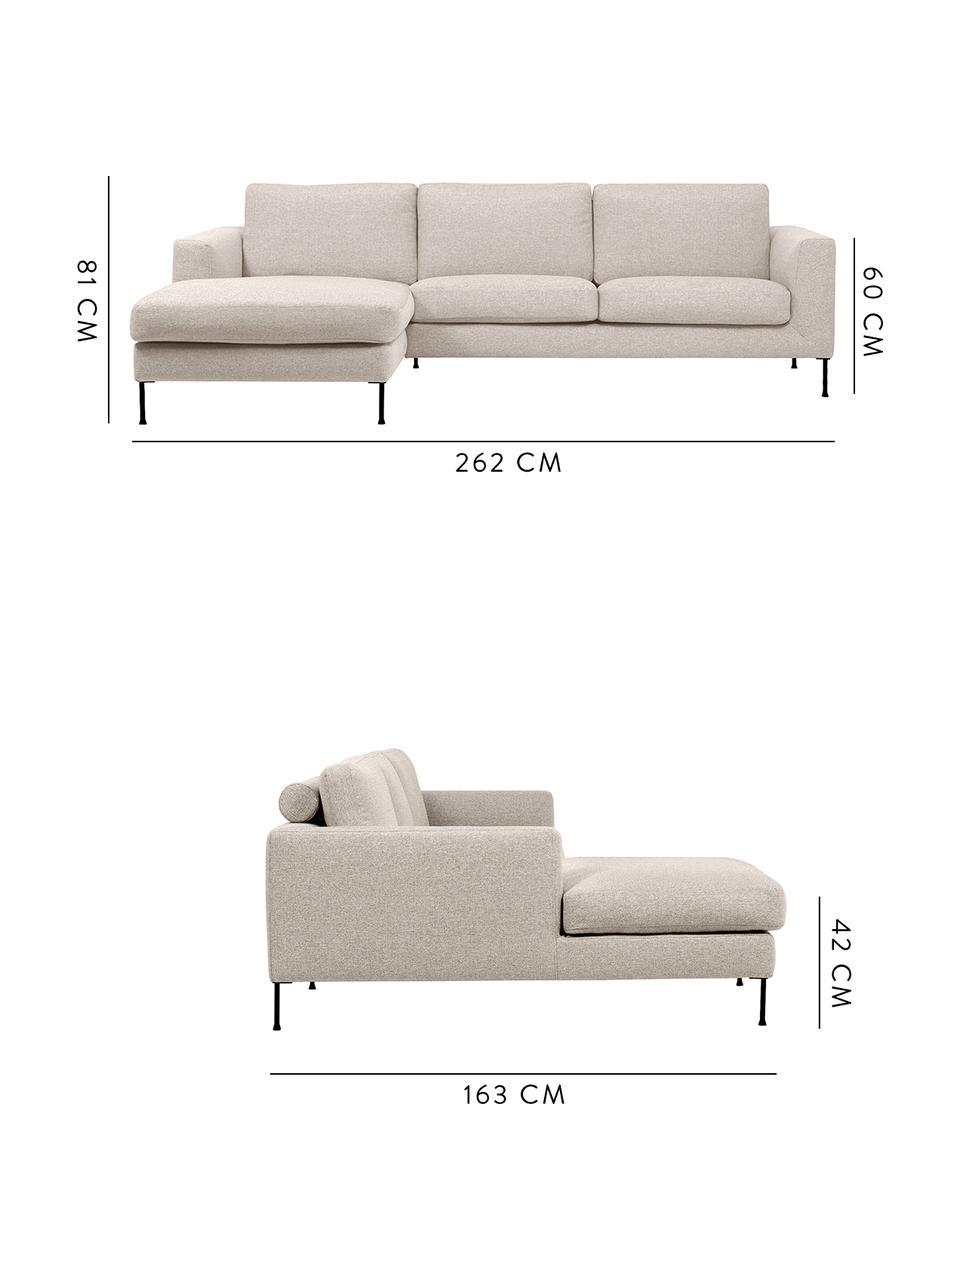 Canapé d'angle 3places beige Cucita, Tissu beige